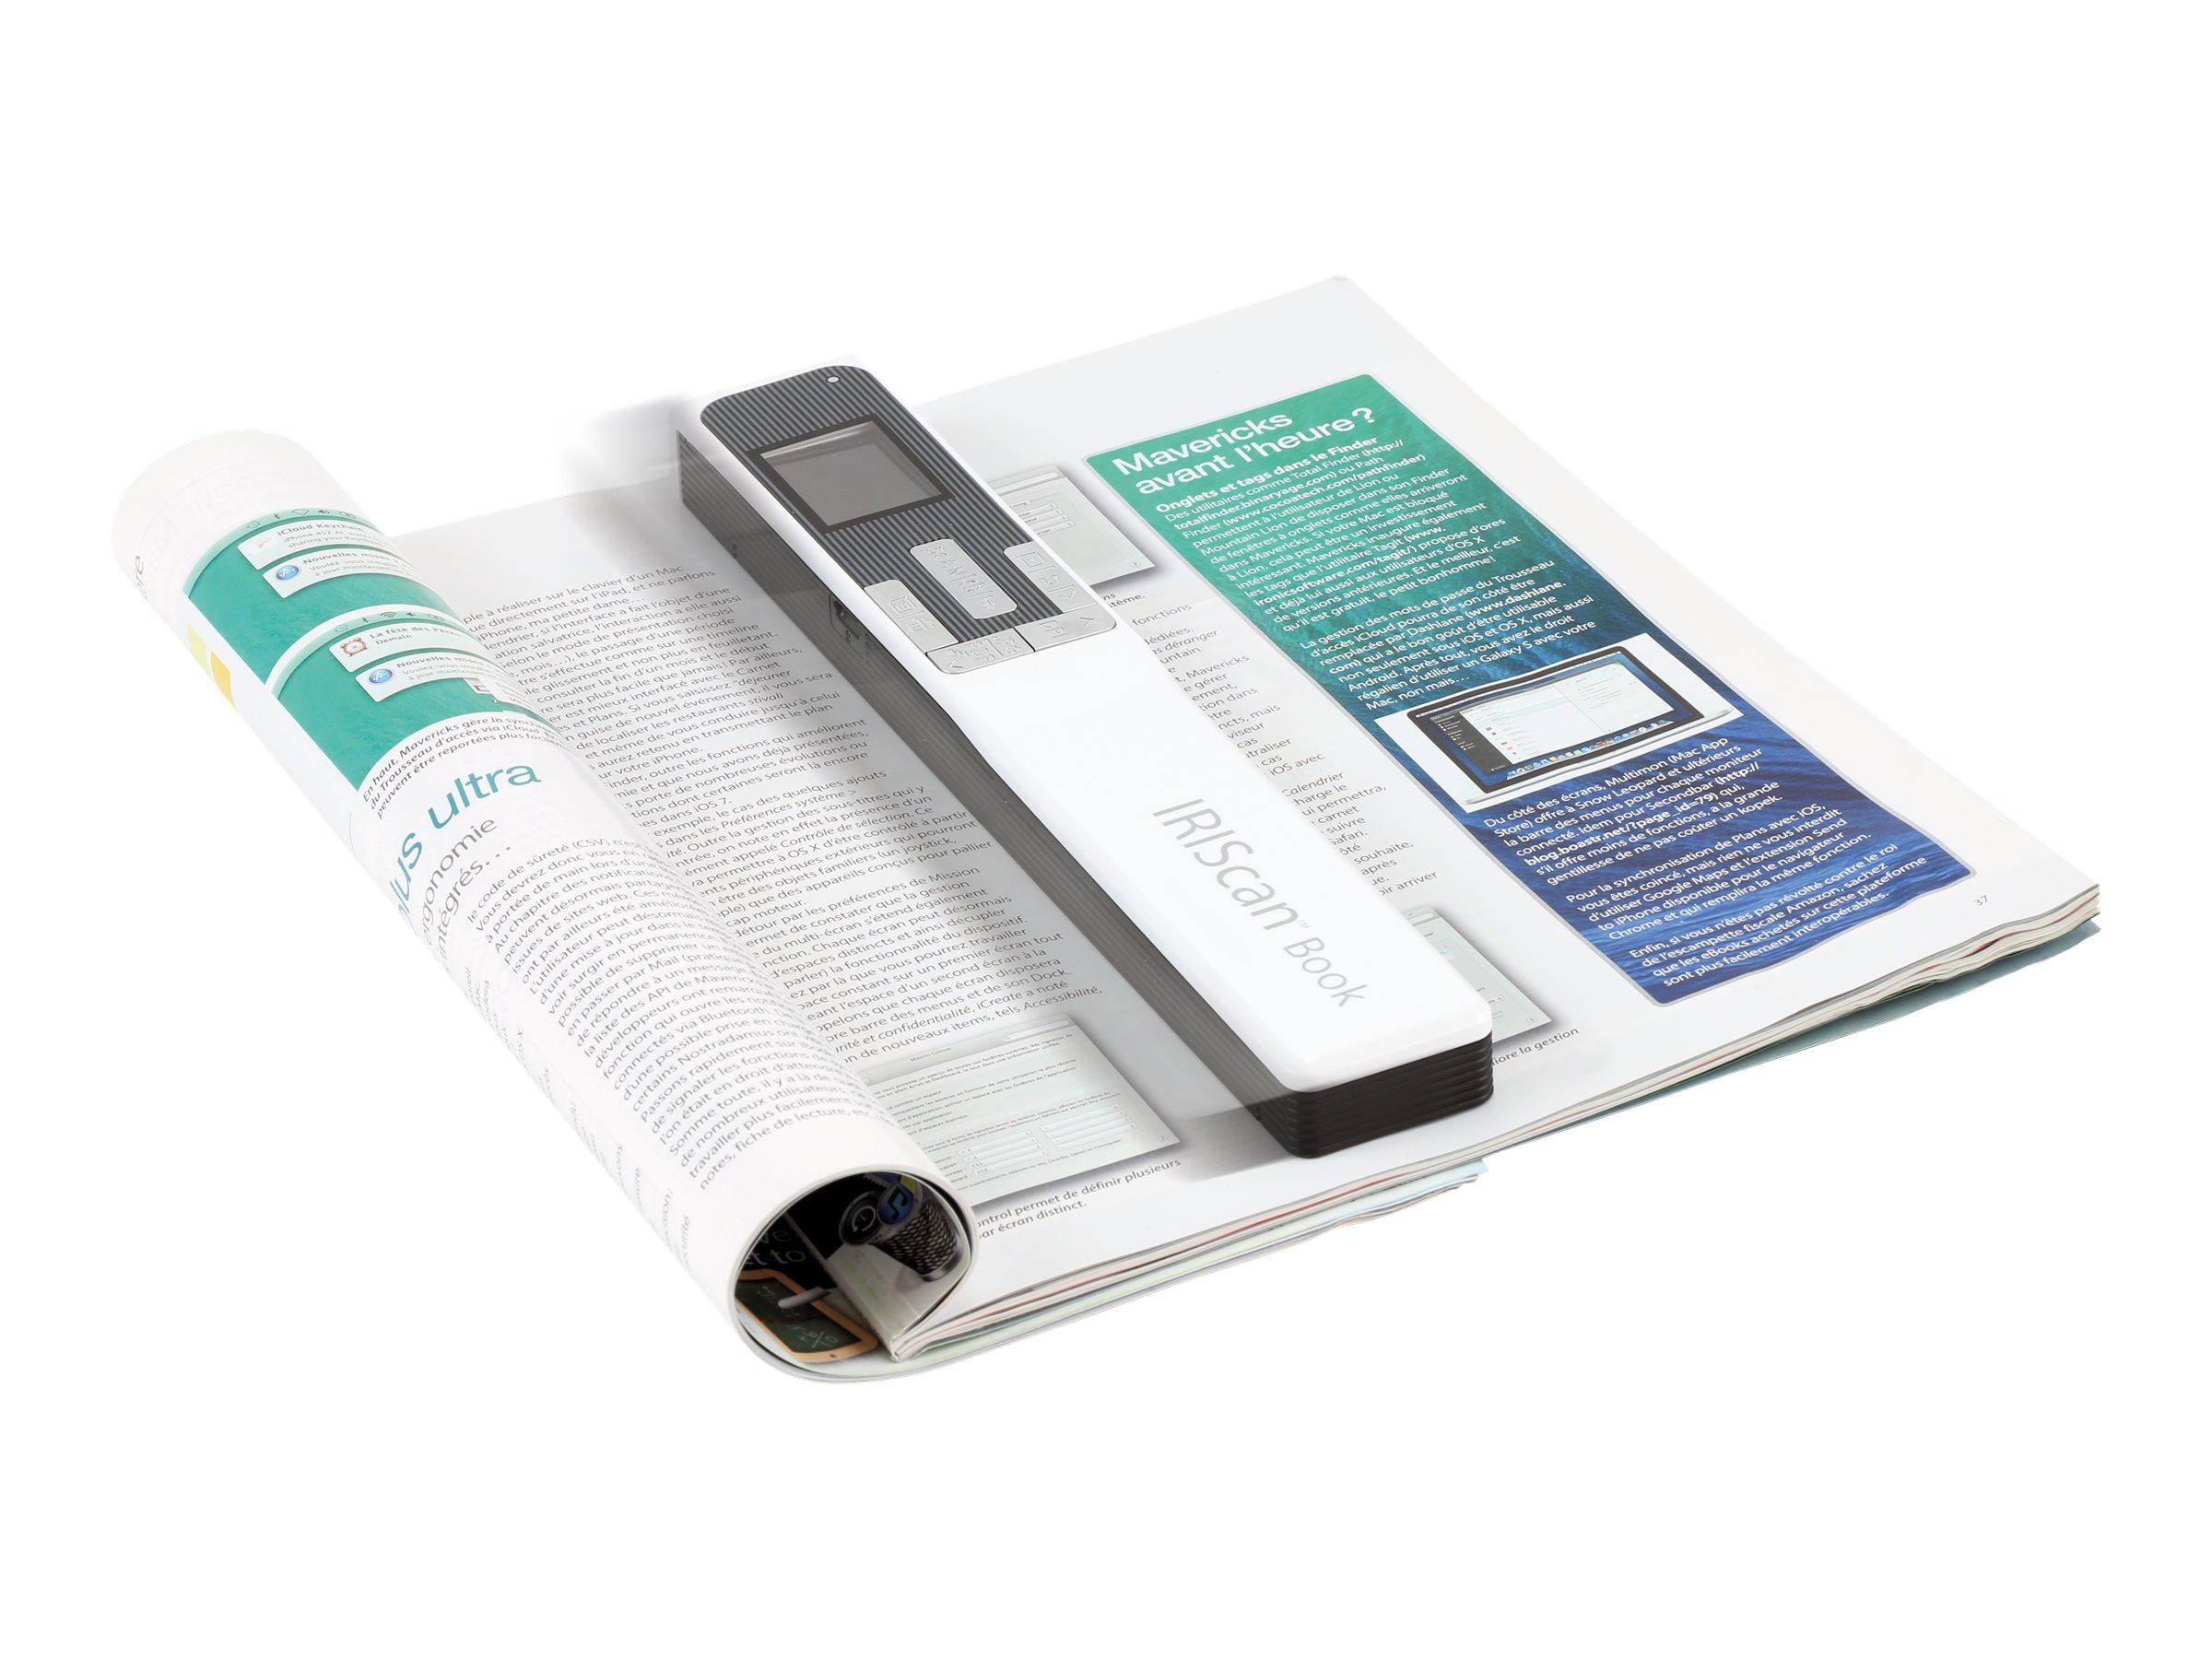 IRIS IRIScan Book 5 - Scanner als Handgerät - Contact Image Sensor (CIS) - A4 - 1200 dpi - USB